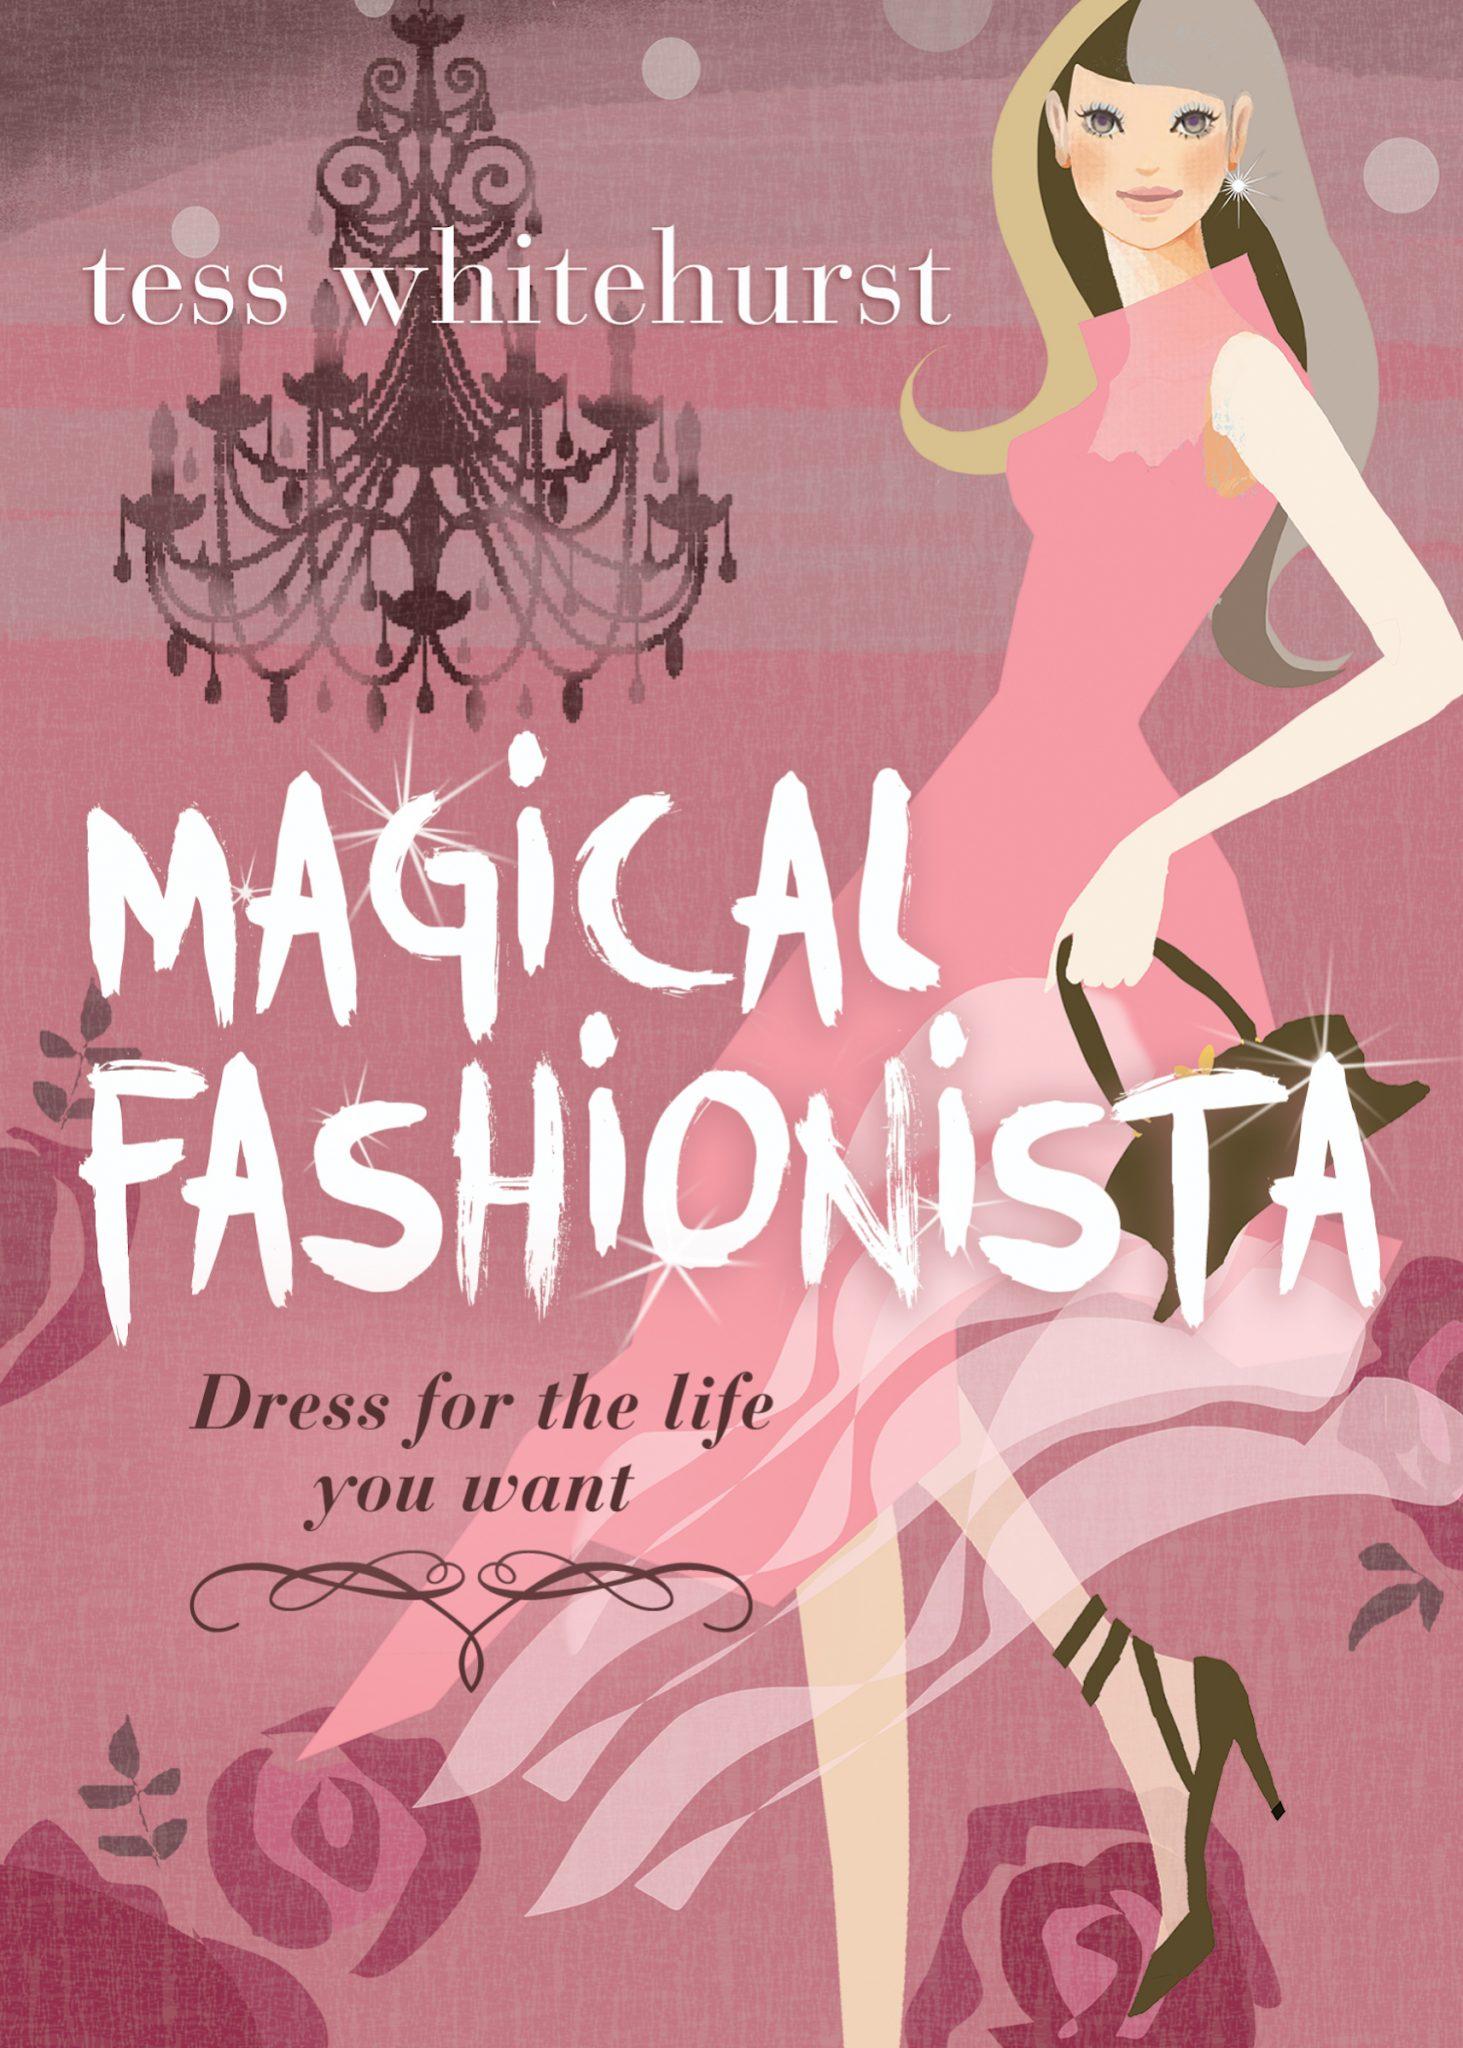 Magical Fashionista by Tess Whitehurst